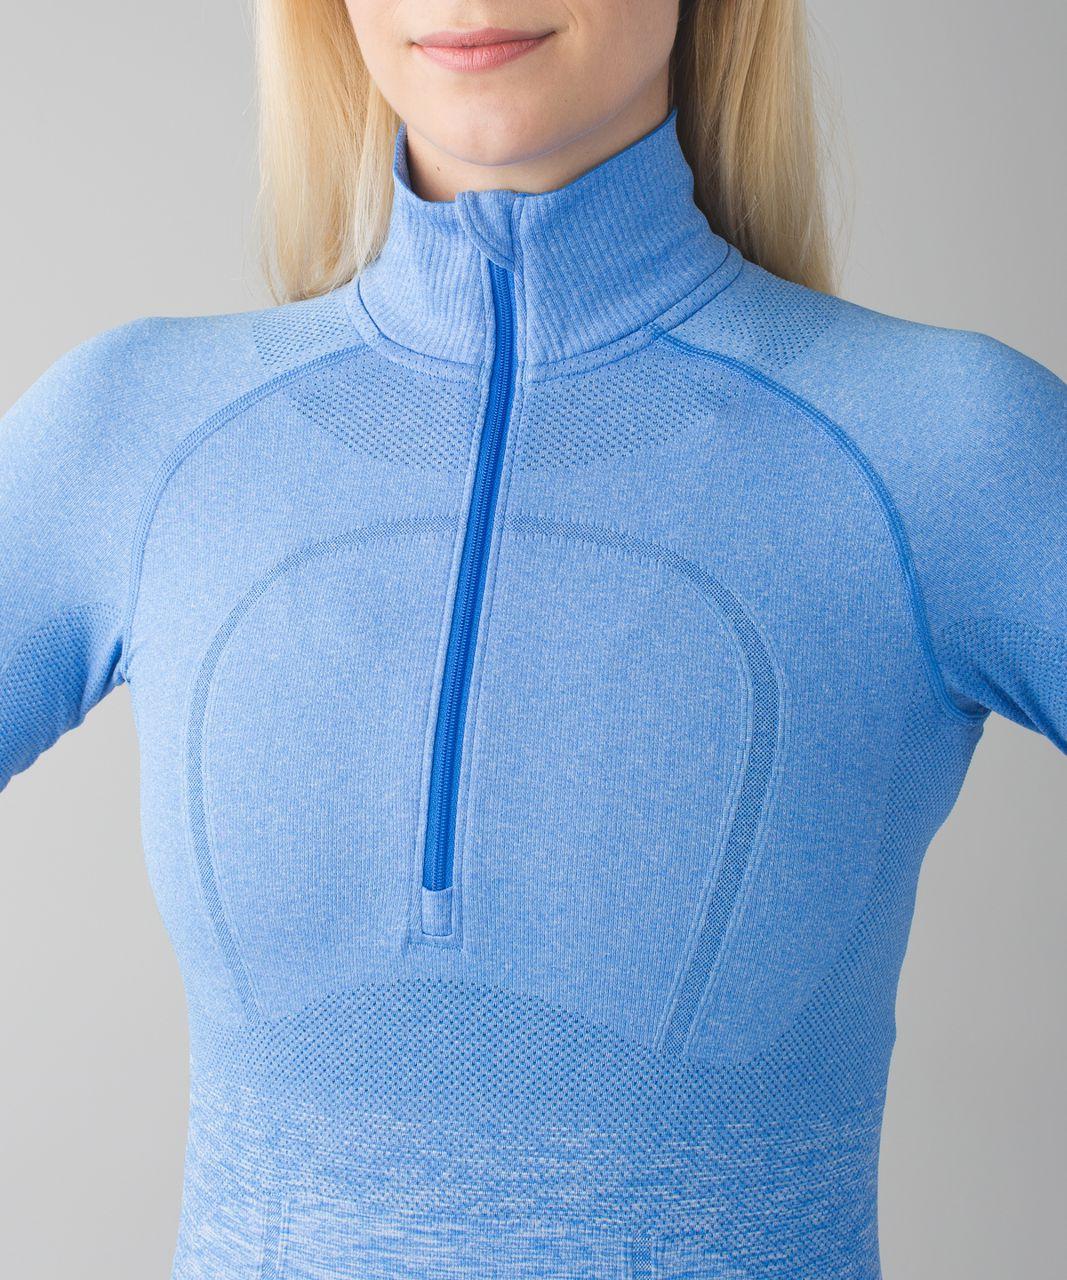 Lululemon Swiftly Tech 1/2 Zip - Heathered Pipe Dream Blue